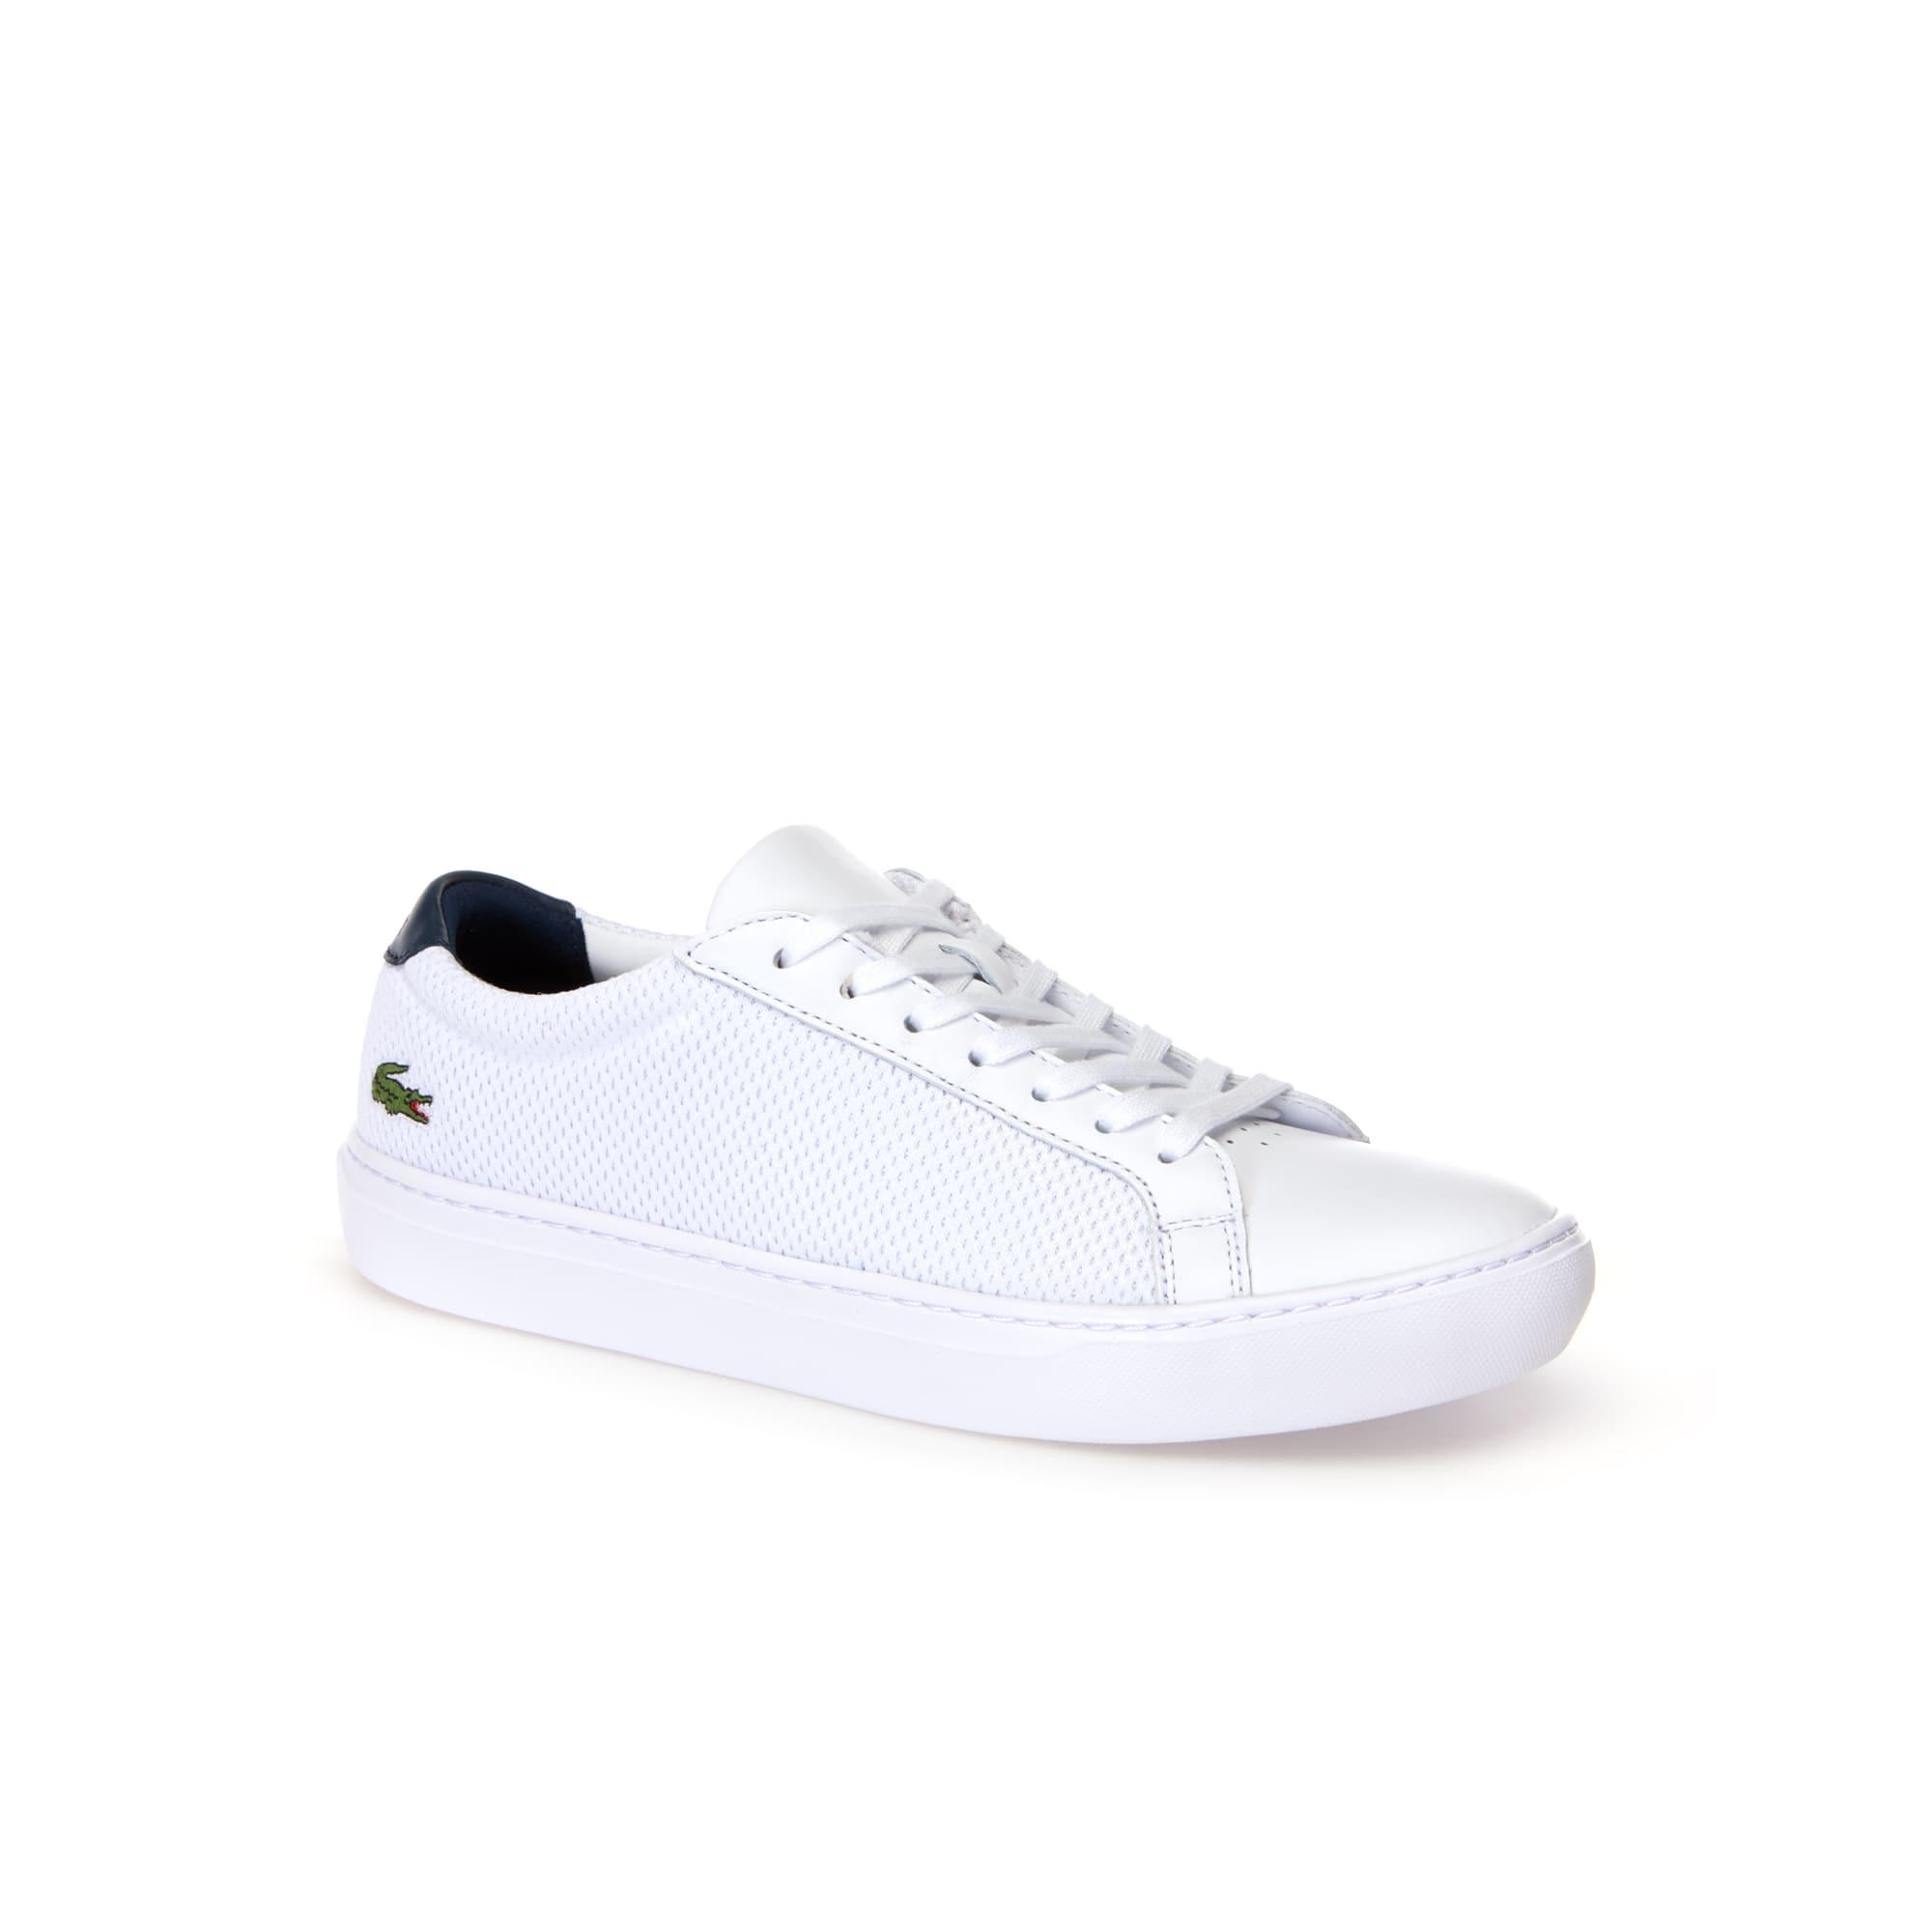 Herren-Sneakers L.12.12 LIGHT-WT aus Leder und Textil